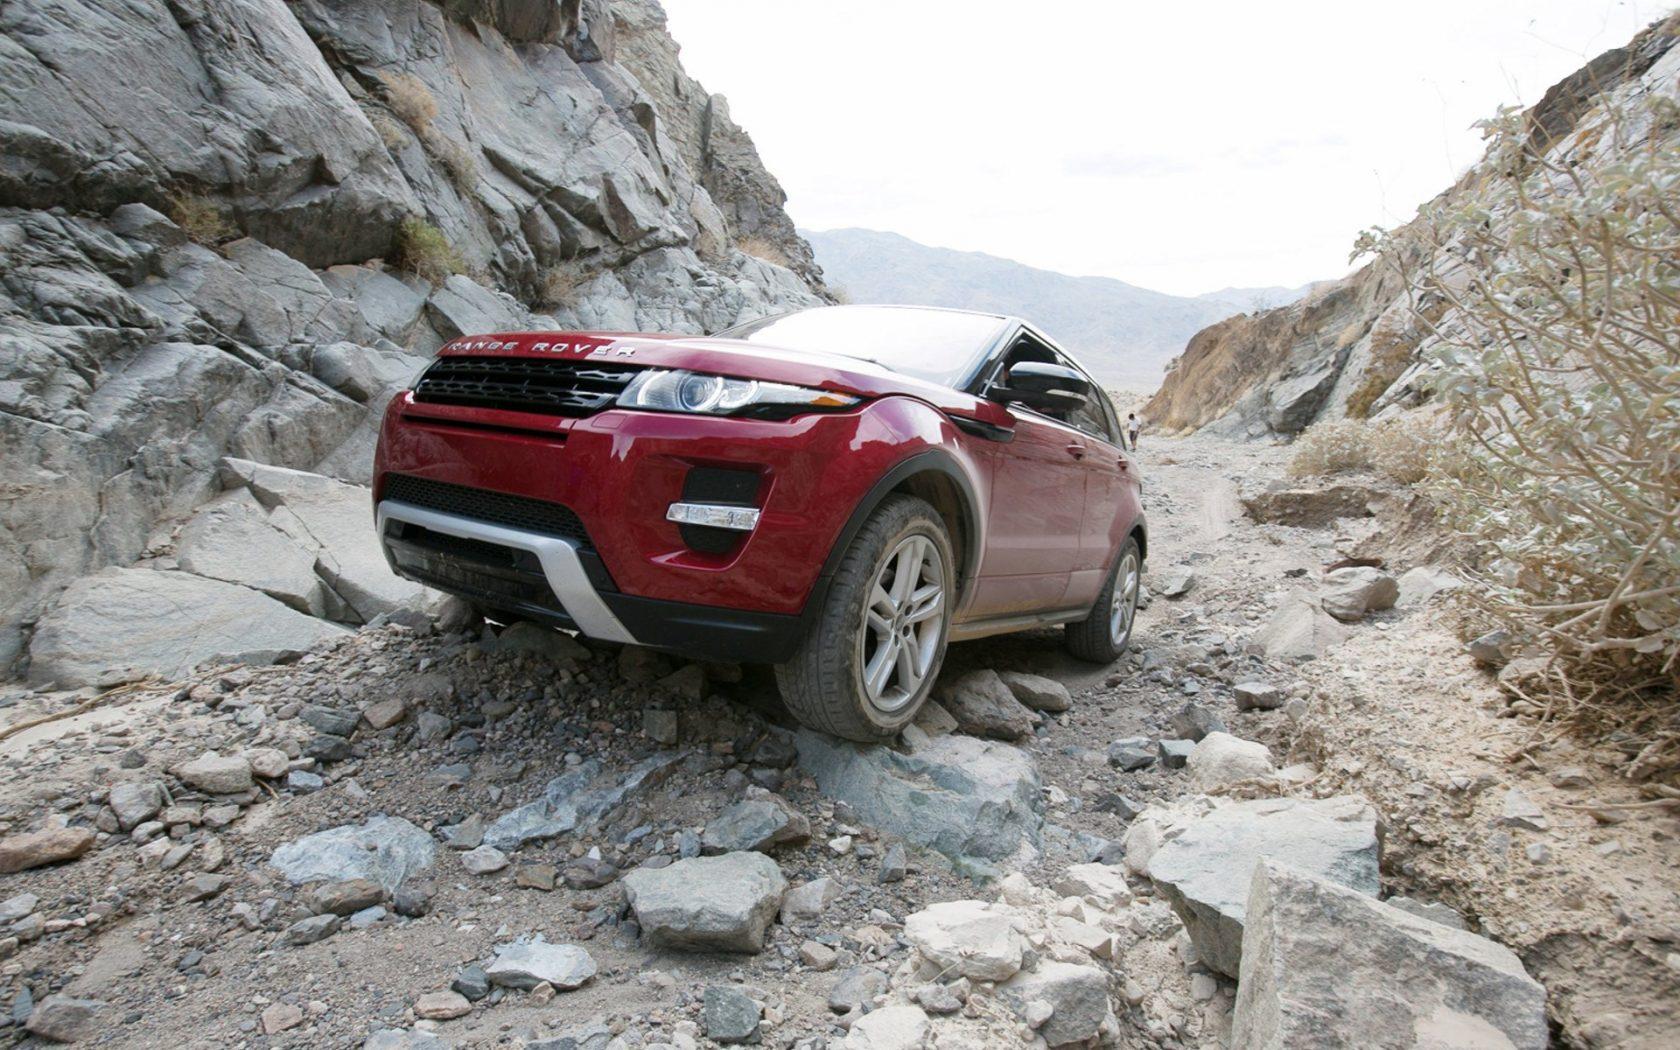 Range Rover Evoque Off Road Wallpaper | HD Wallpaper ...